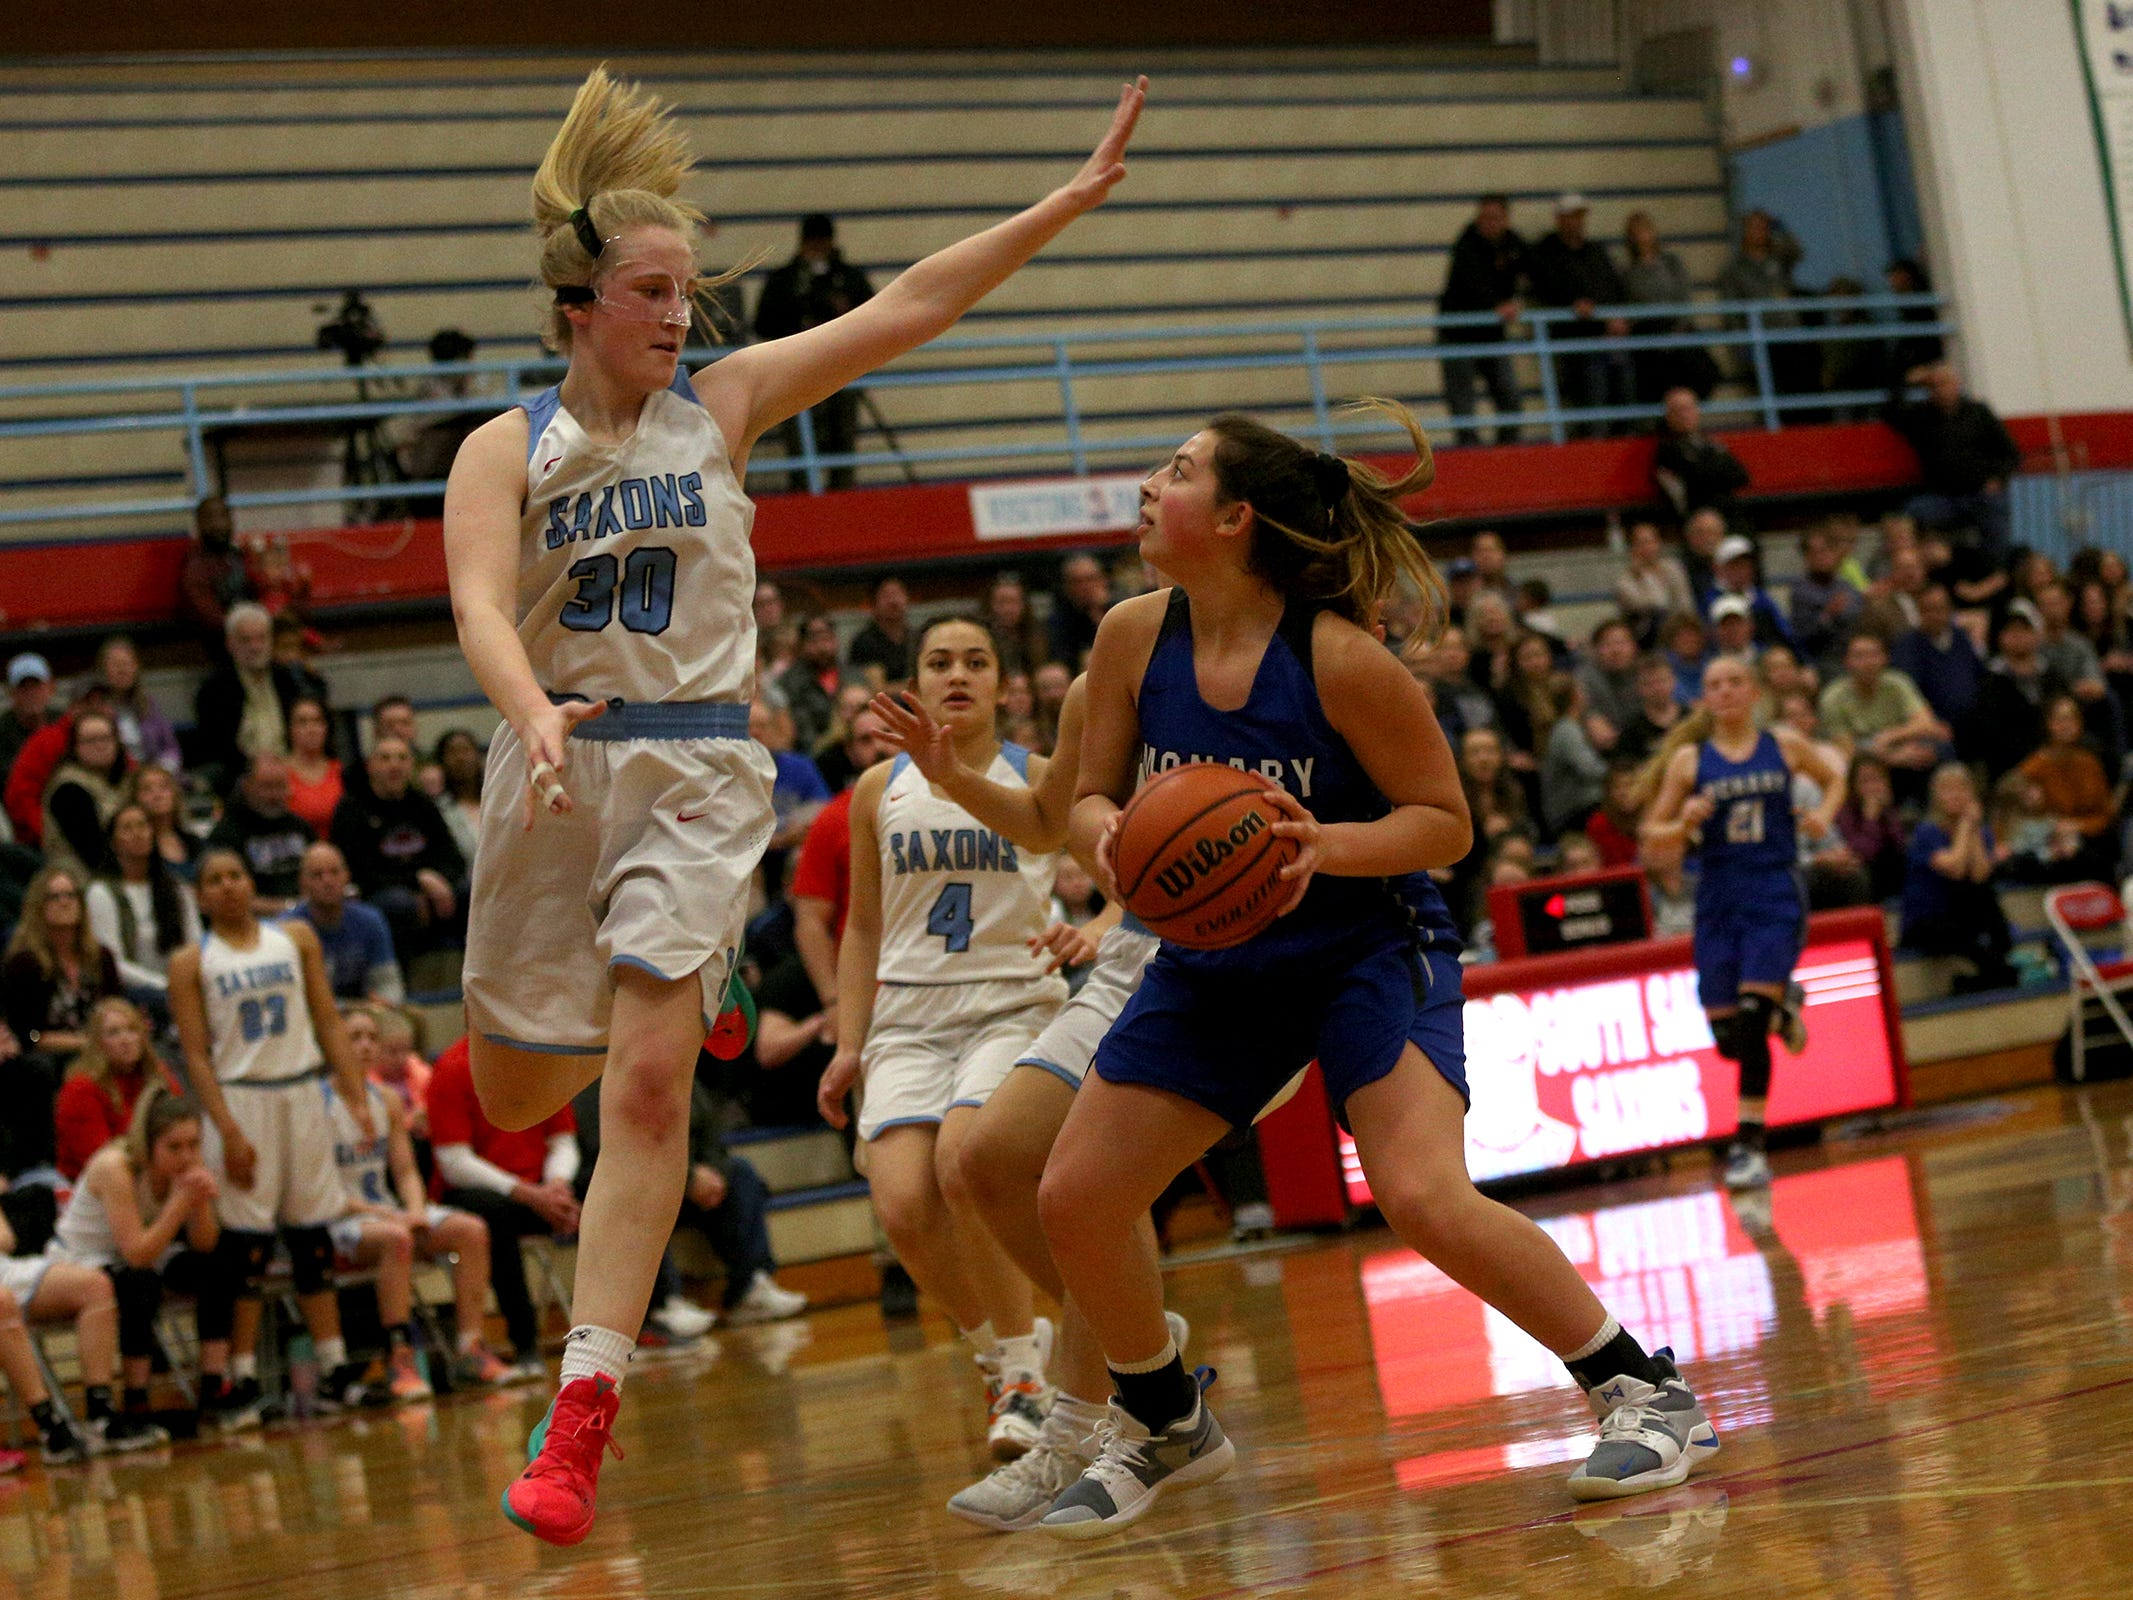 South Salem's Gretchen Olsen (30) blocks McNary's Mackenzie Proctor (33) during the South Salem High School girls basketball game against McNary High School in Salem on Thursday, Jan. 31, 2019.